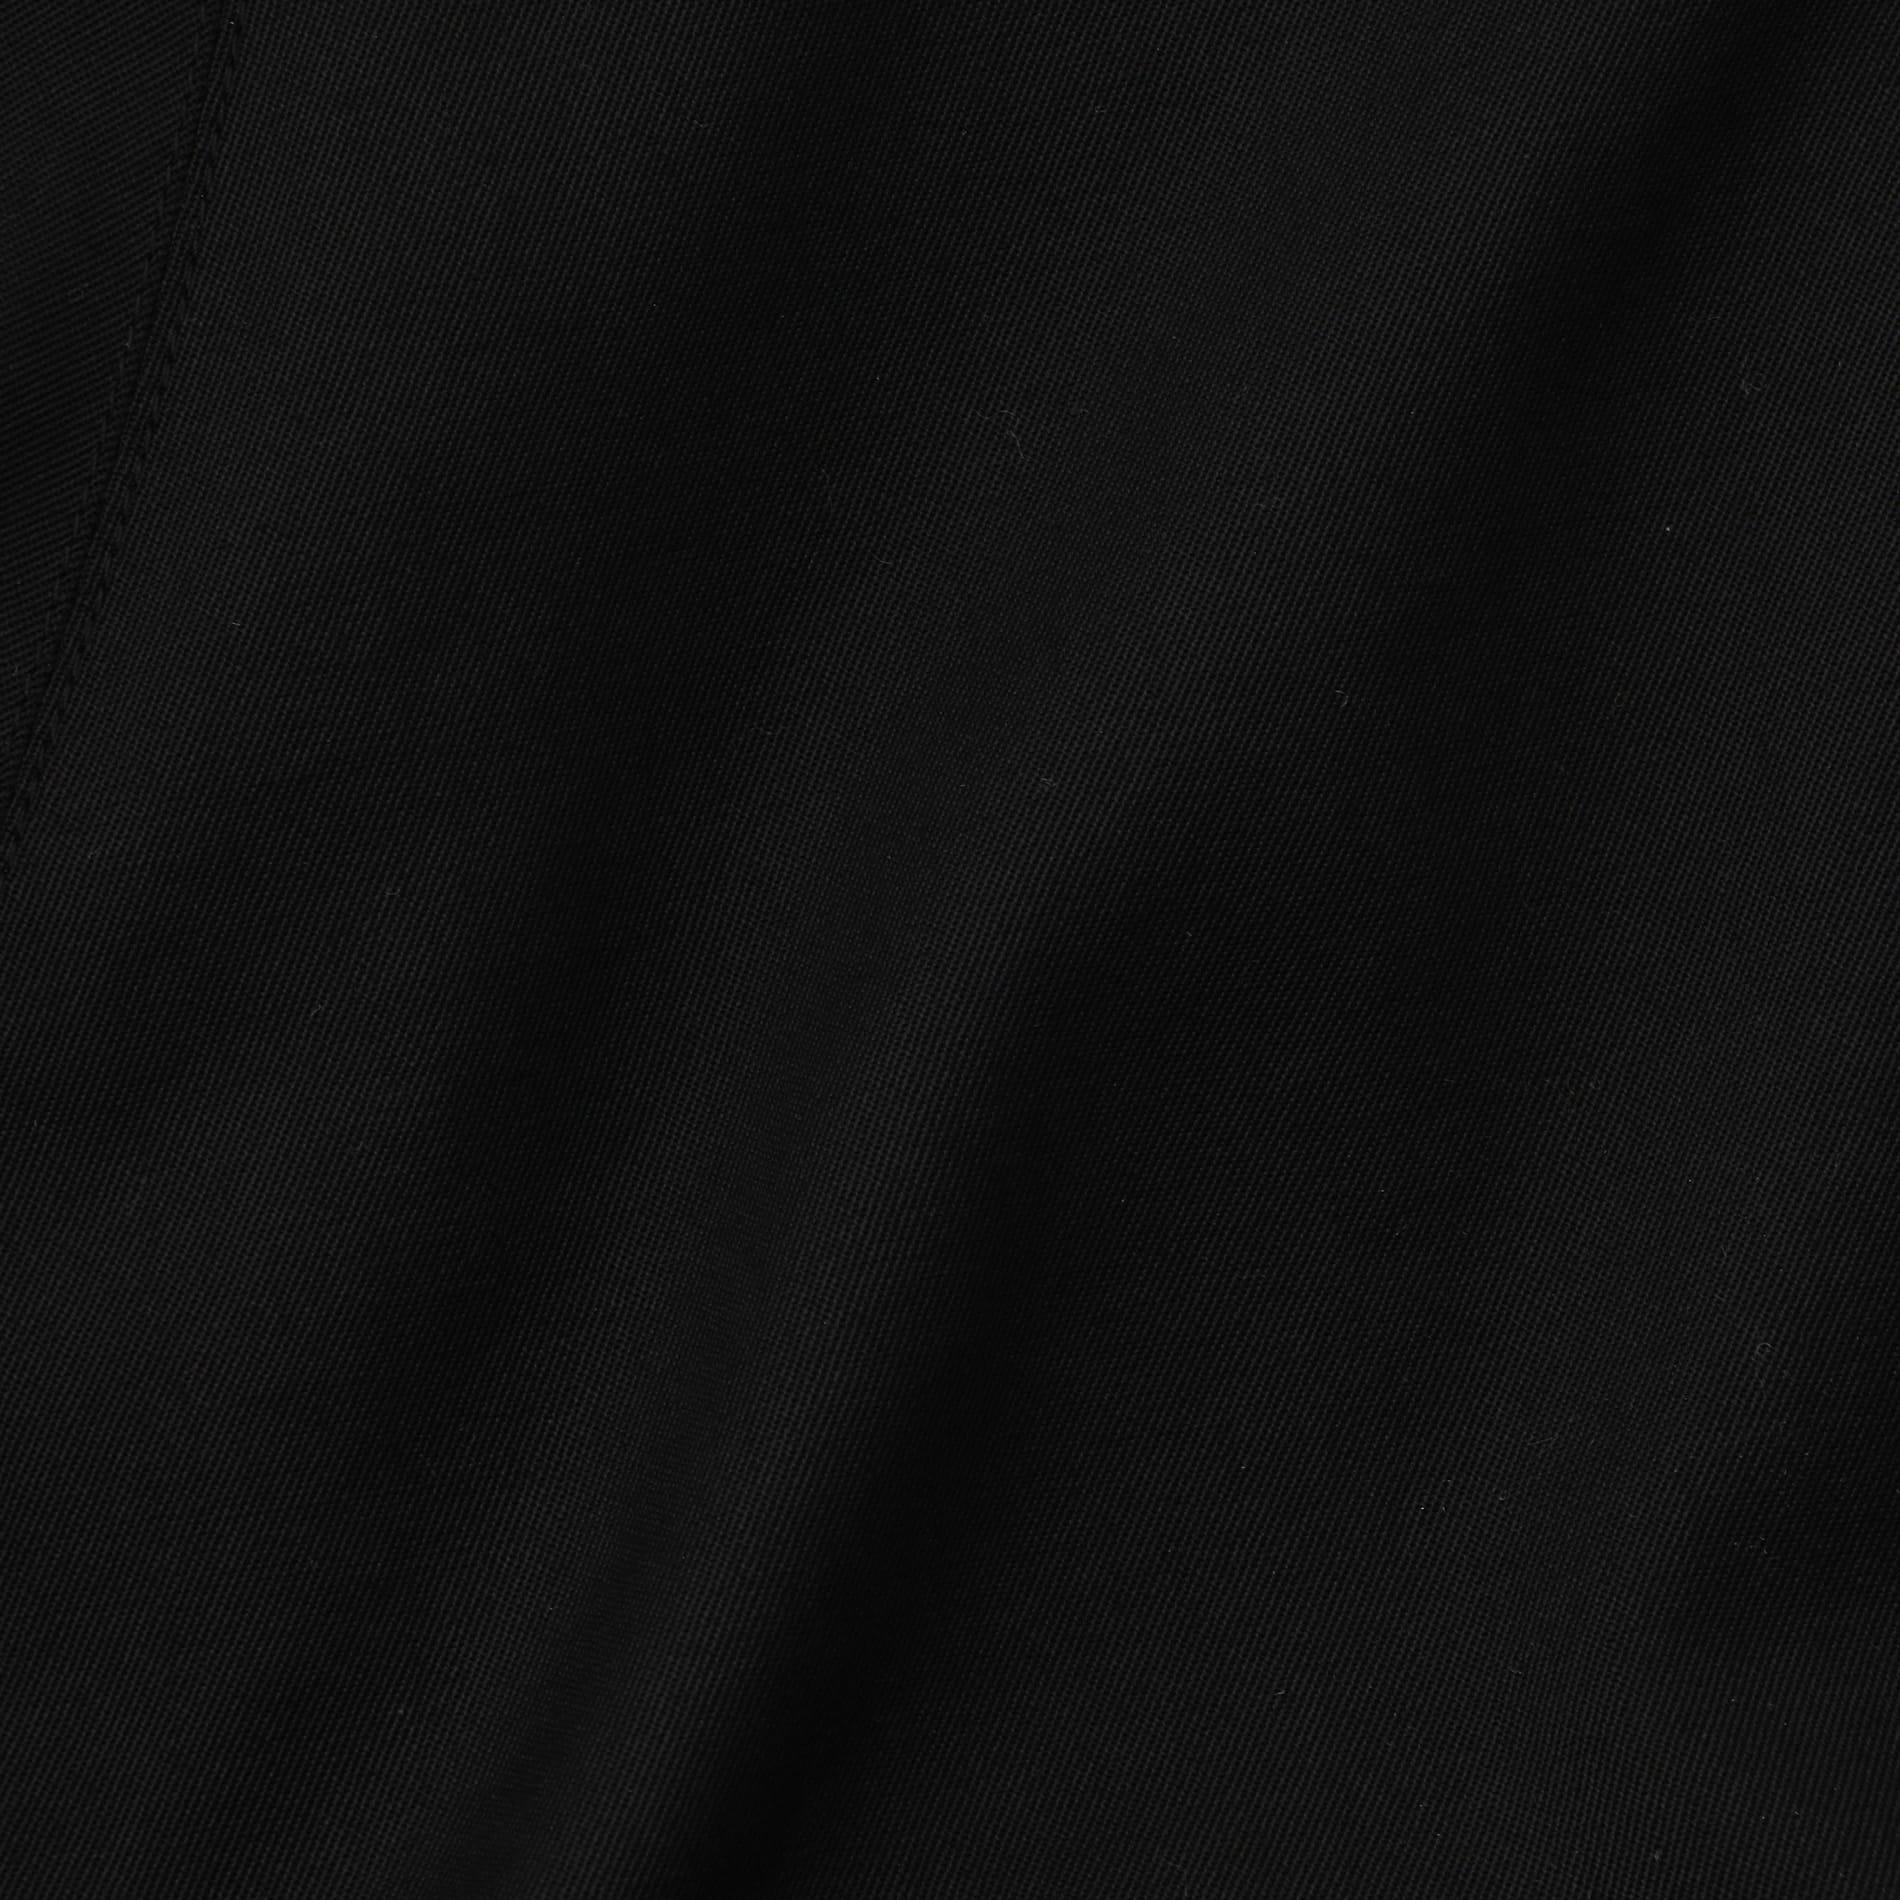 【JW ANDERSON】WOMEN BUBBLE HEM SKIRT SK0053-PG0011